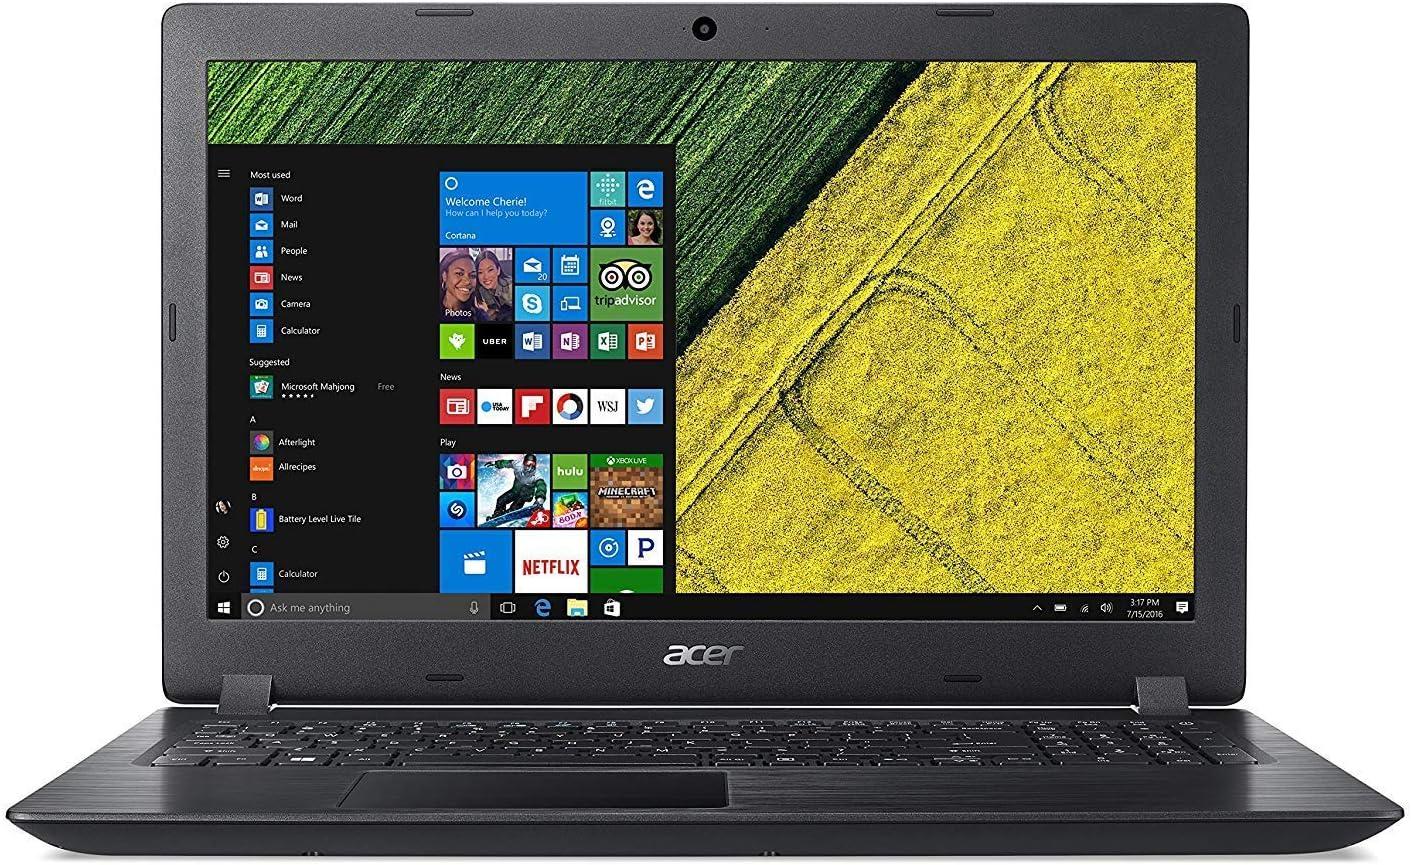 "2019 Acer Aspire 3 Premium Laptop Computer| 15.6"" FHD Screen| 7th Gen AMD A9-9420 up to 3.6GHz| 8GB DDR4 RAM| 1TB HDD + 128GB SSD| Bluetooth| USB 3.0| HDMI| Windows 10 Home"